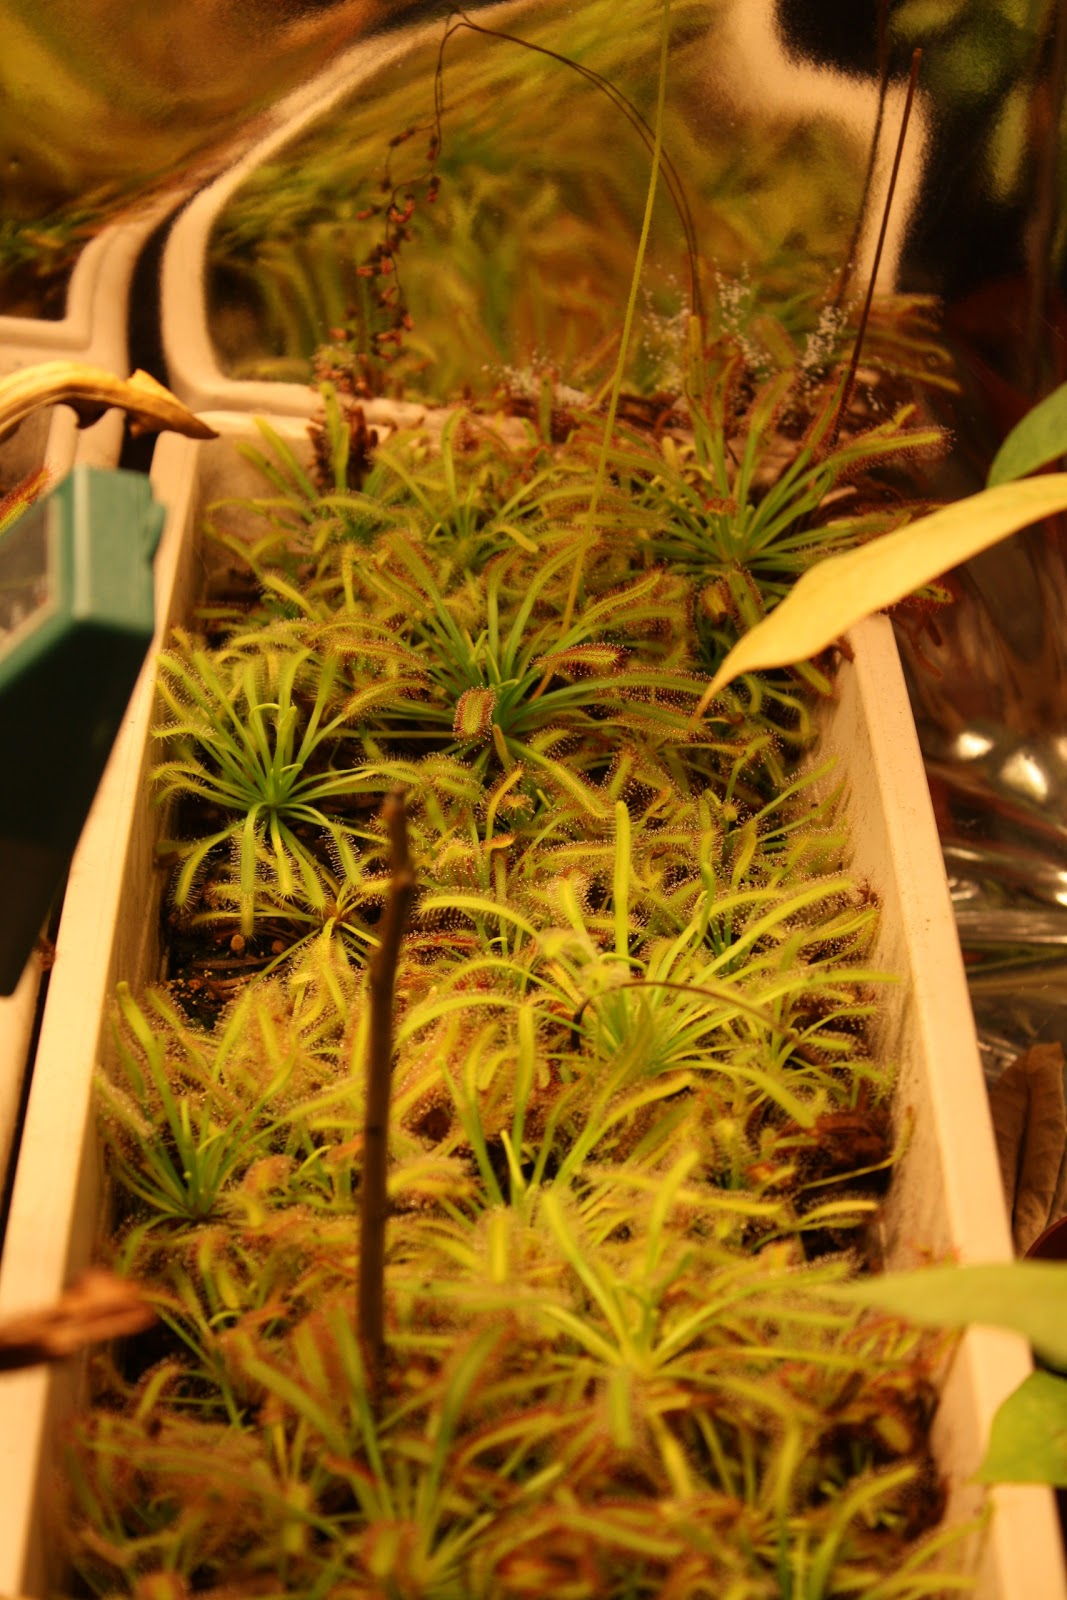 notre ti chez nous plantes culture de drosera capensis. Black Bedroom Furniture Sets. Home Design Ideas